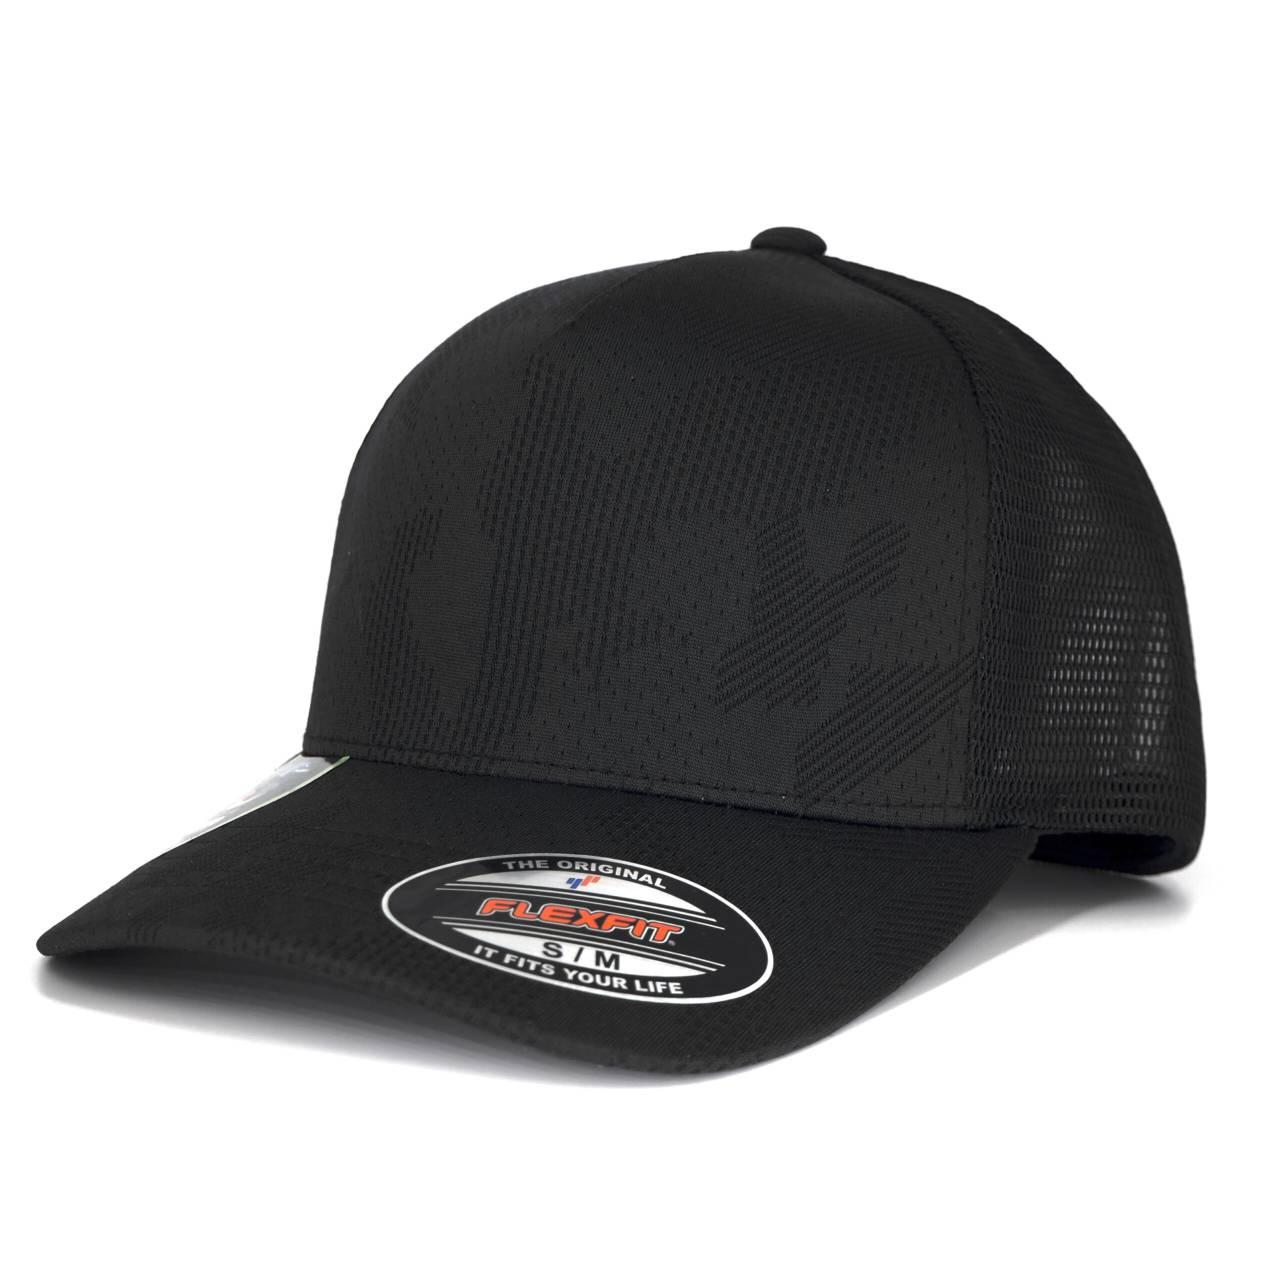 6277JC-00007-0044 FLEXFIT JAQUARD CAMO STRETCH BLACK CAP